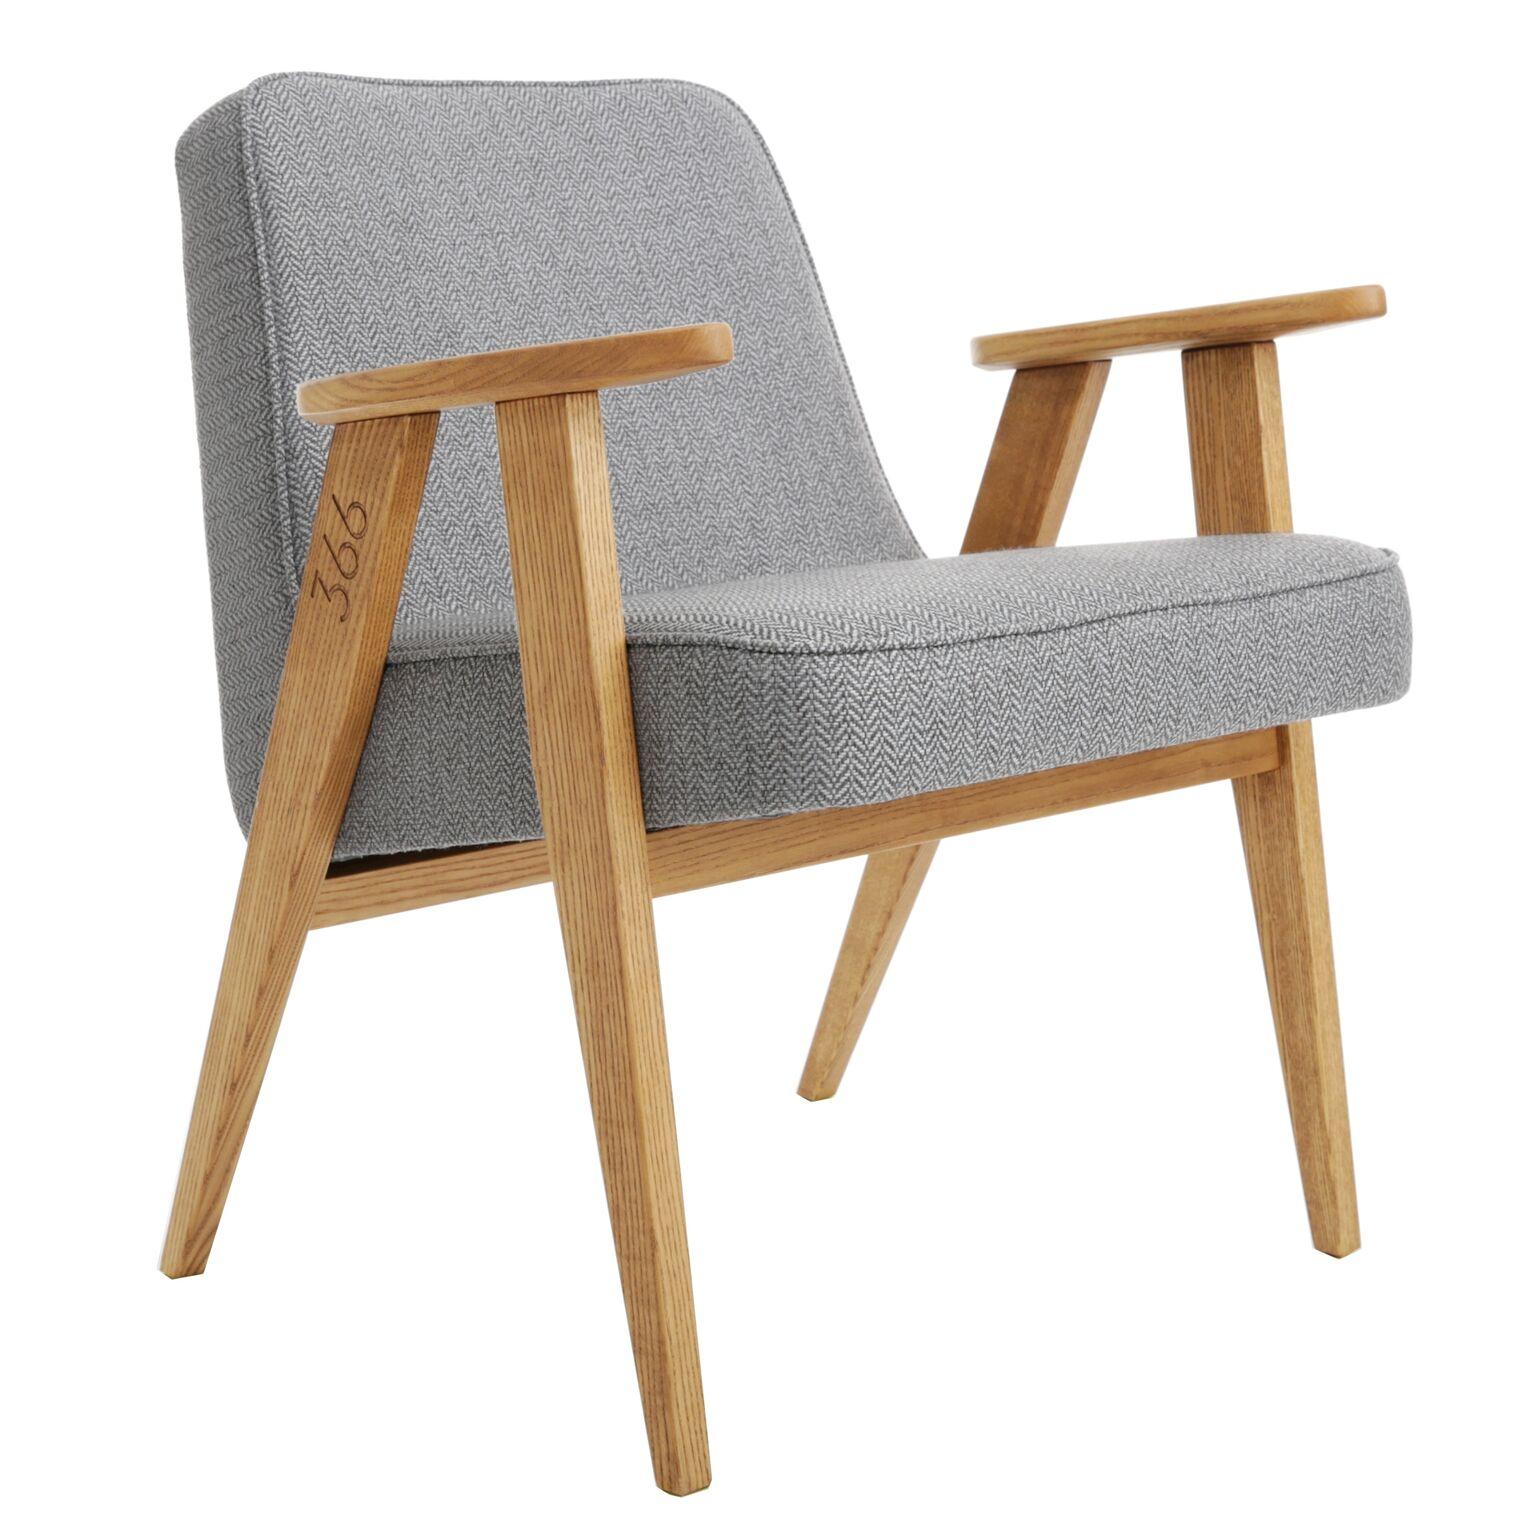 366 Easy Chair - Tweed Grey - merk: 366 Concept s.c.